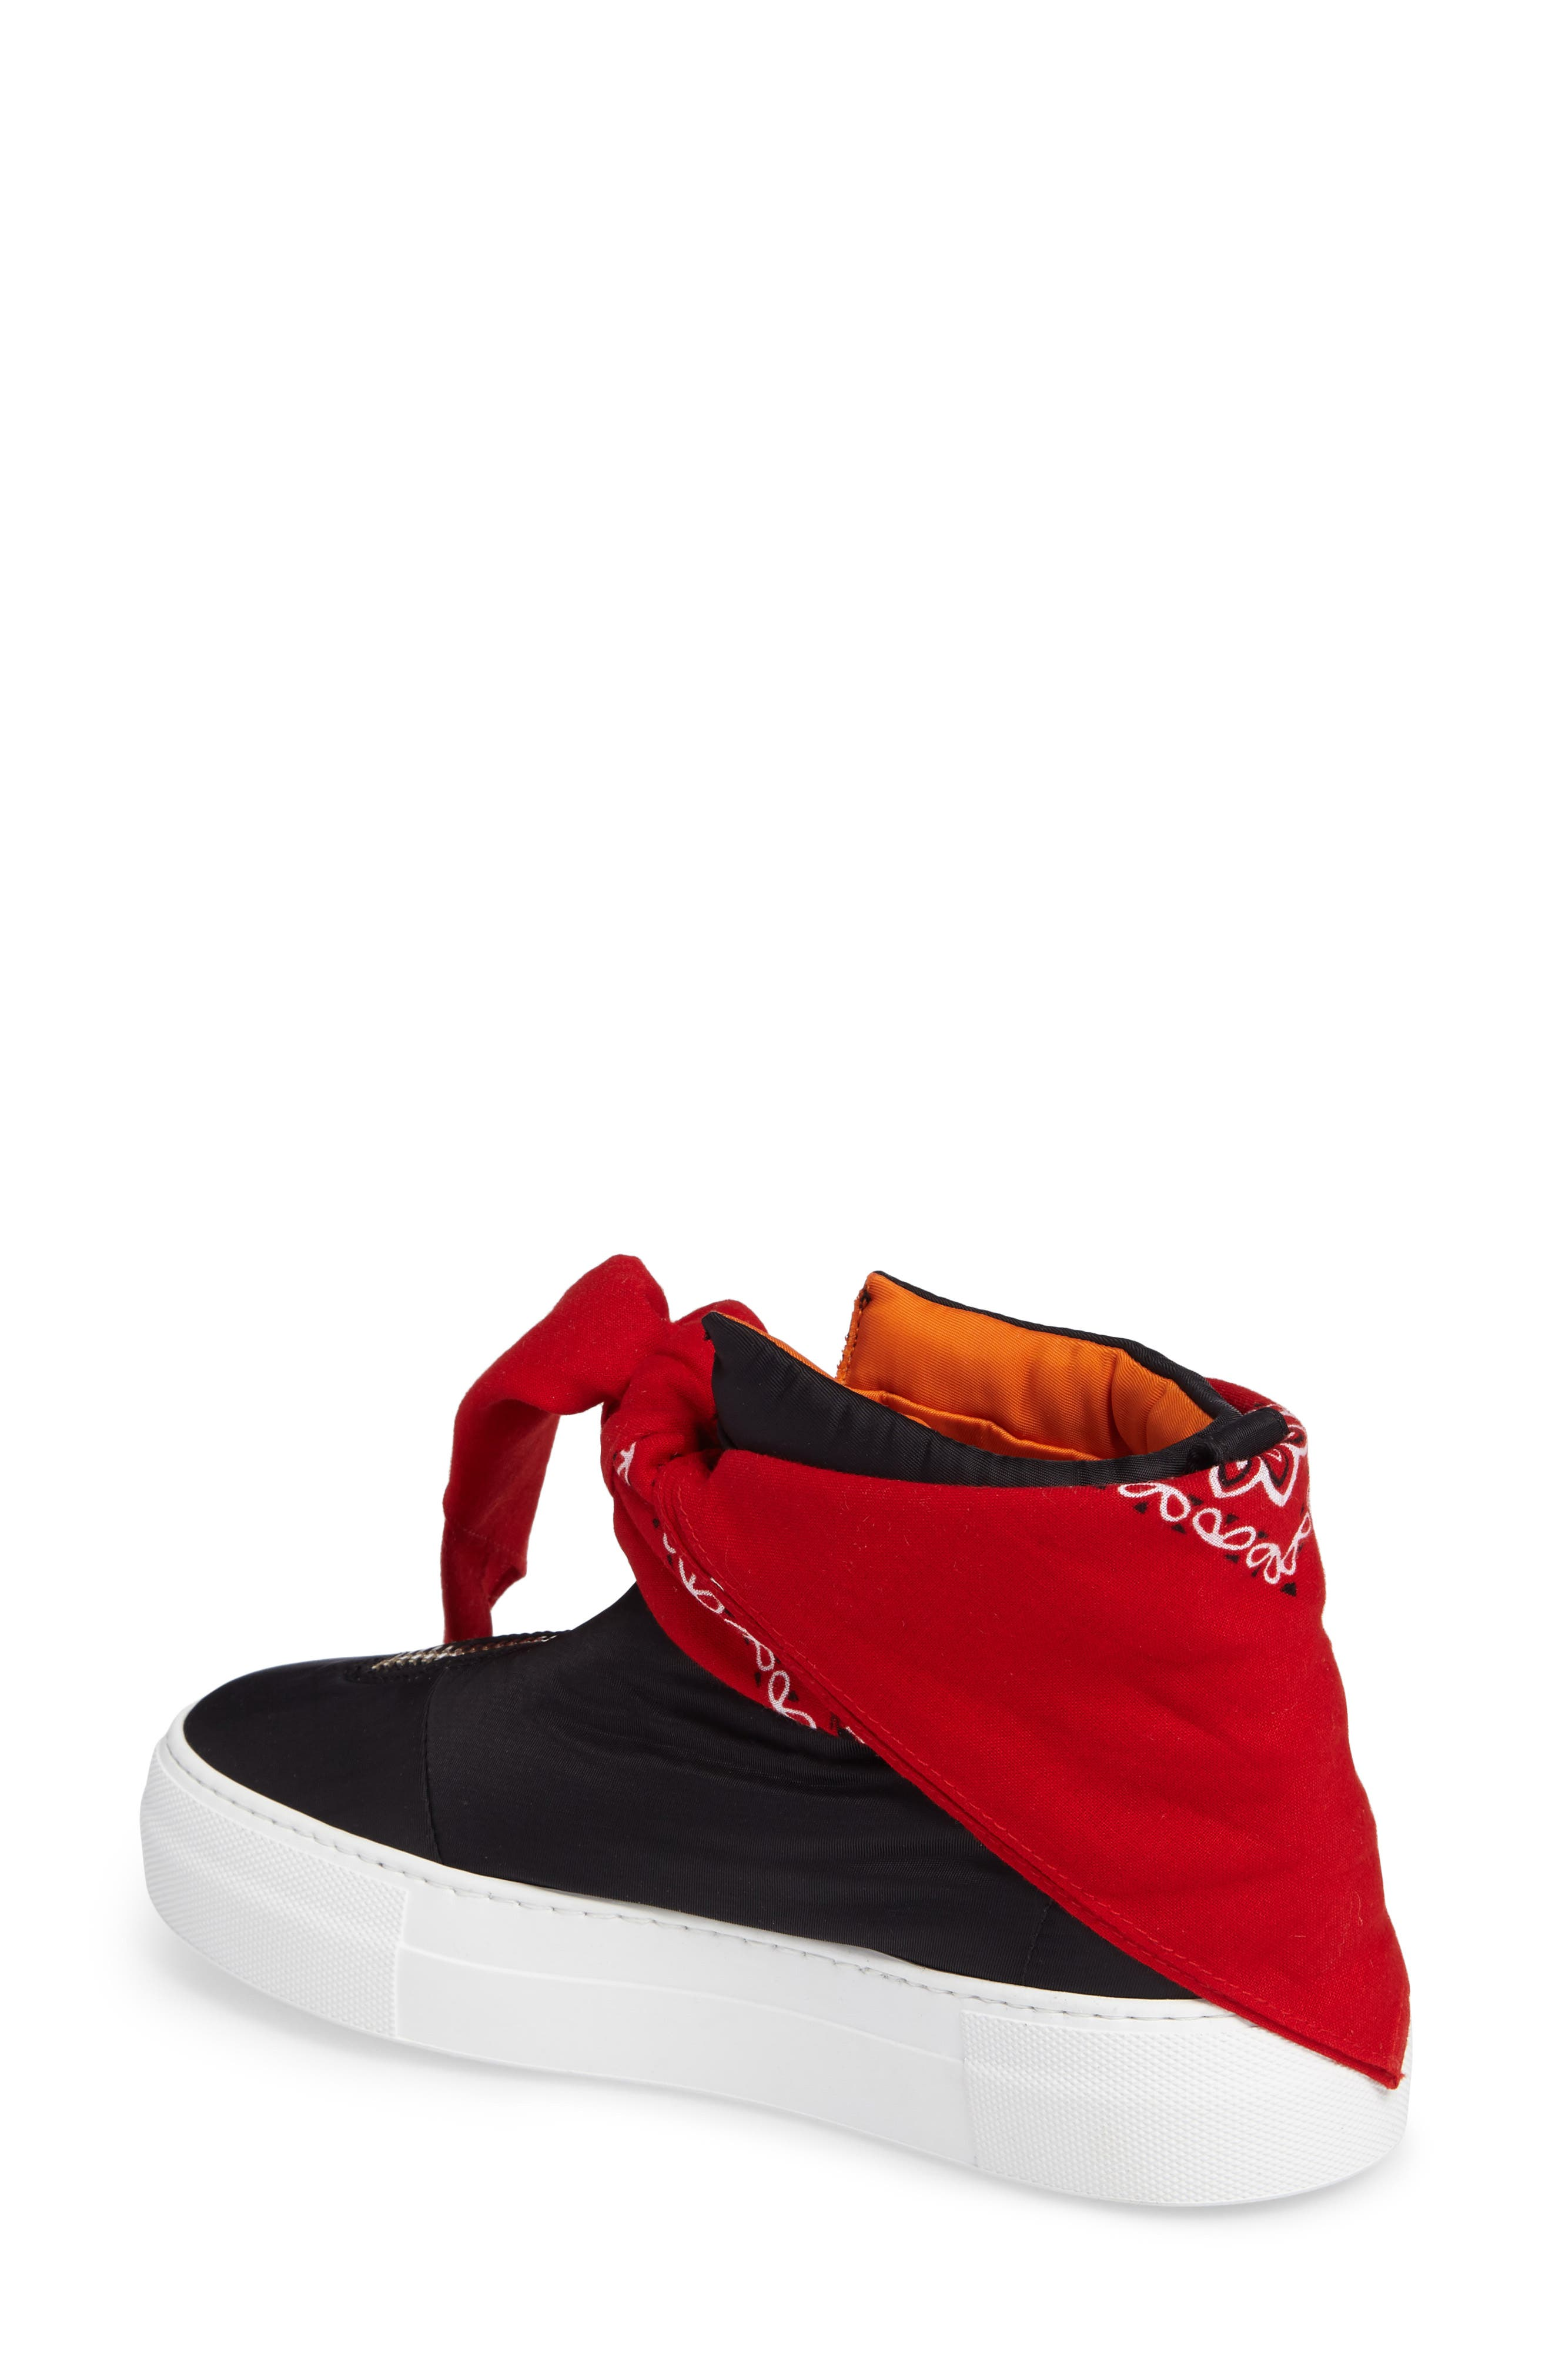 Bandana High Top Sneaker,                             Alternate thumbnail 2, color,                             001